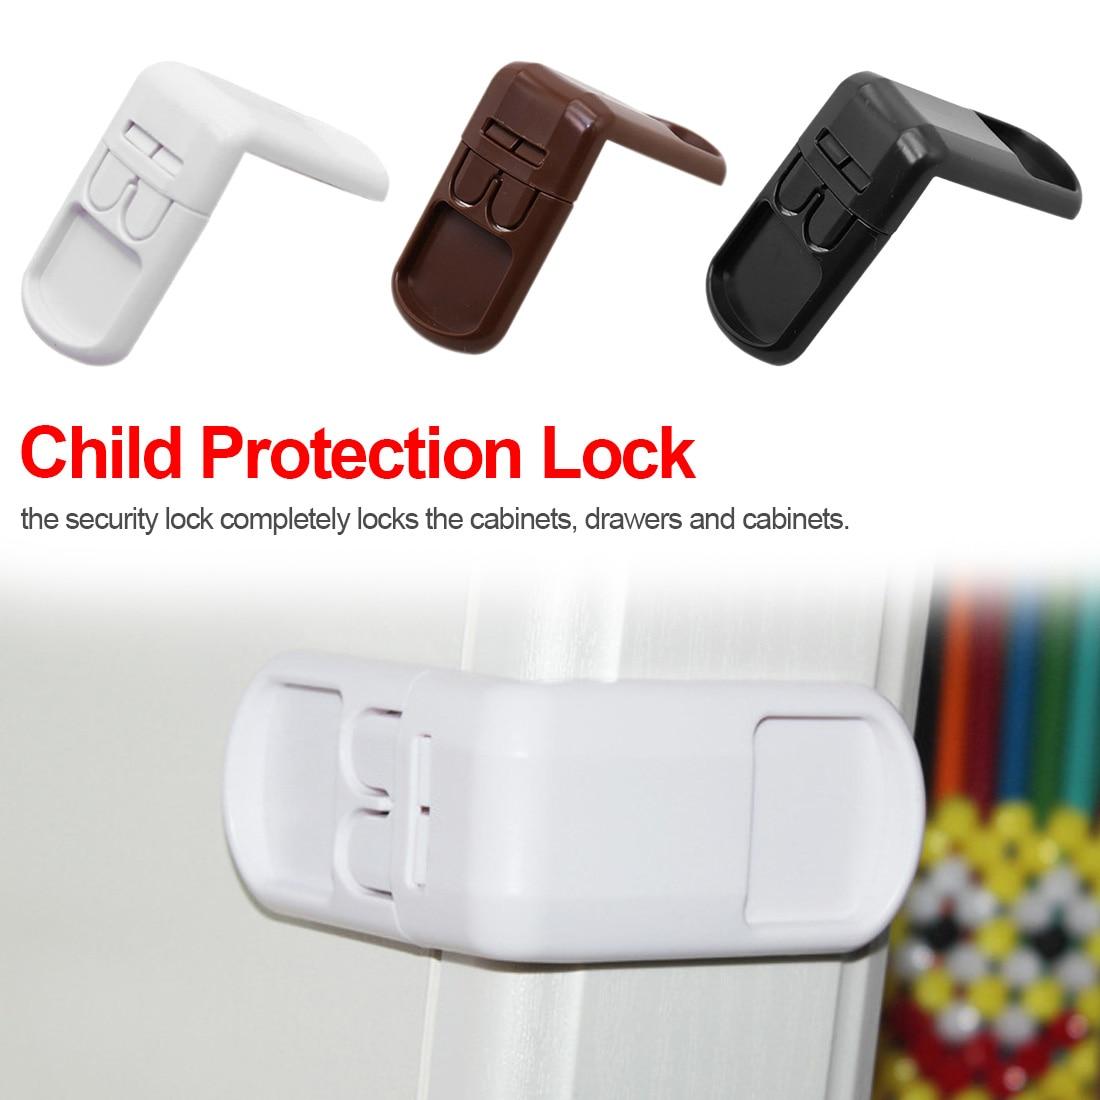 Child Lock Protection Of Children 4Pcs  Locking Doors For Children's Safety Kids Safety Plastic Lock For Child Infant Baby Locks